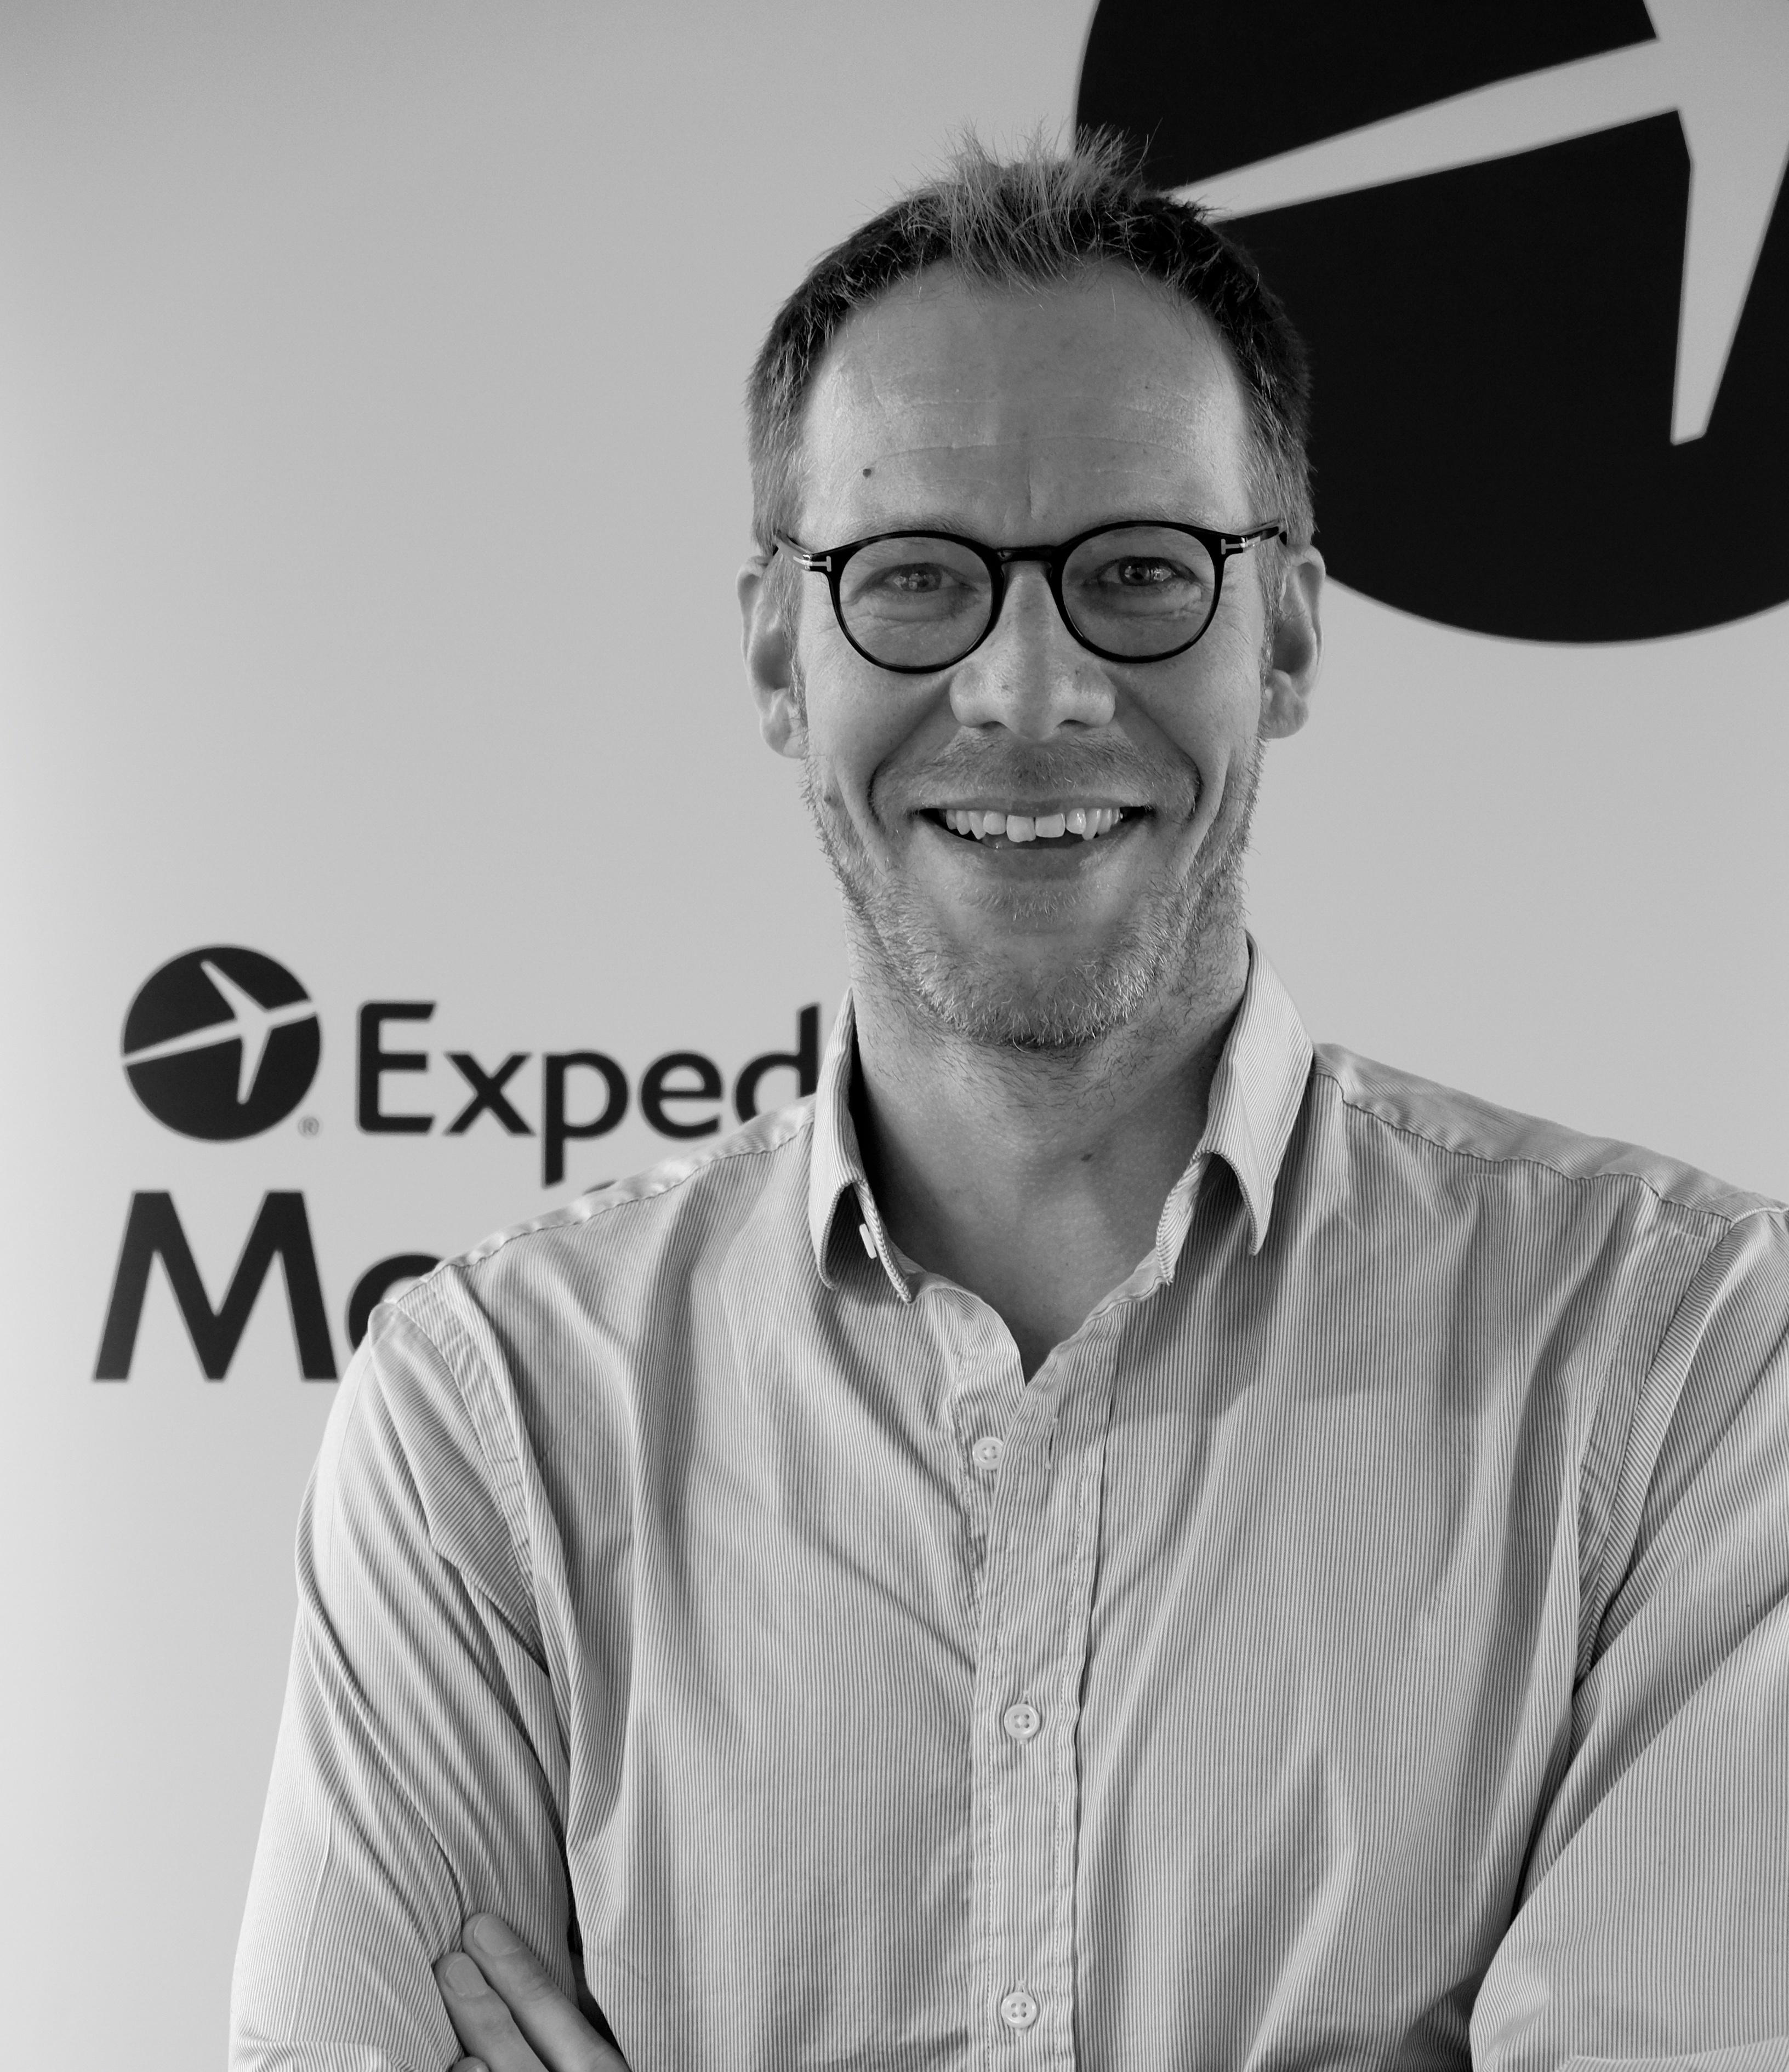 Andrew van der Feltz, Senior Director, EMEA & APAC